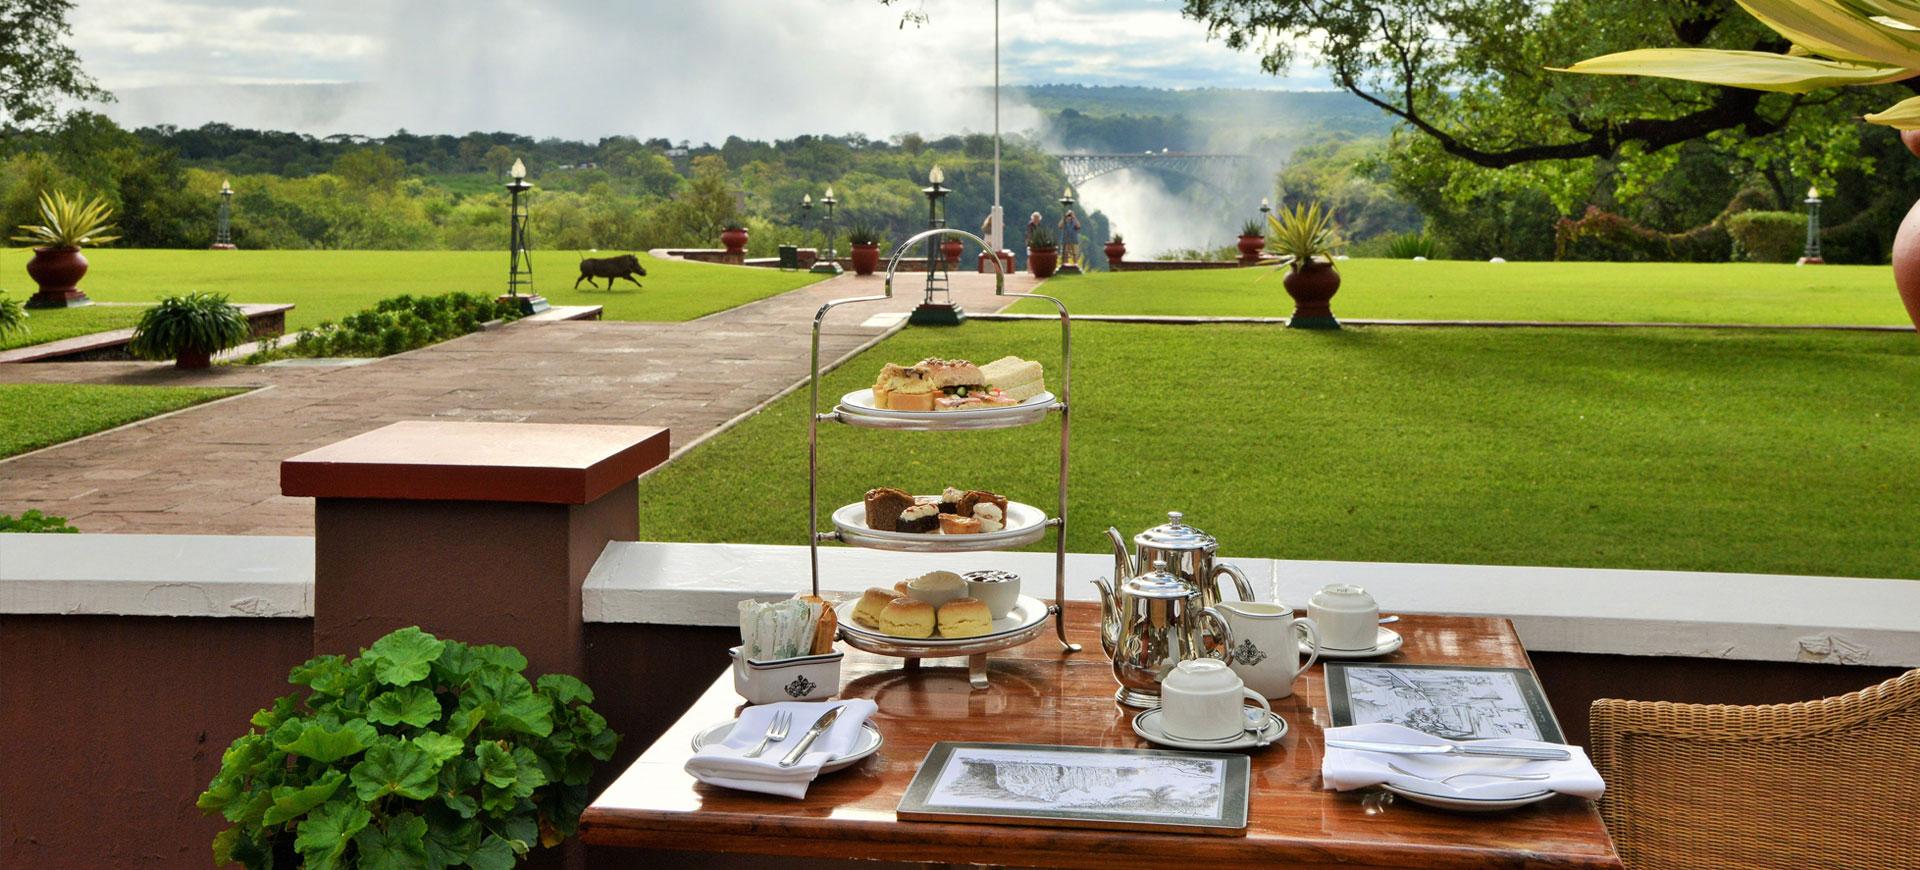 Victoria Falls Catering Services